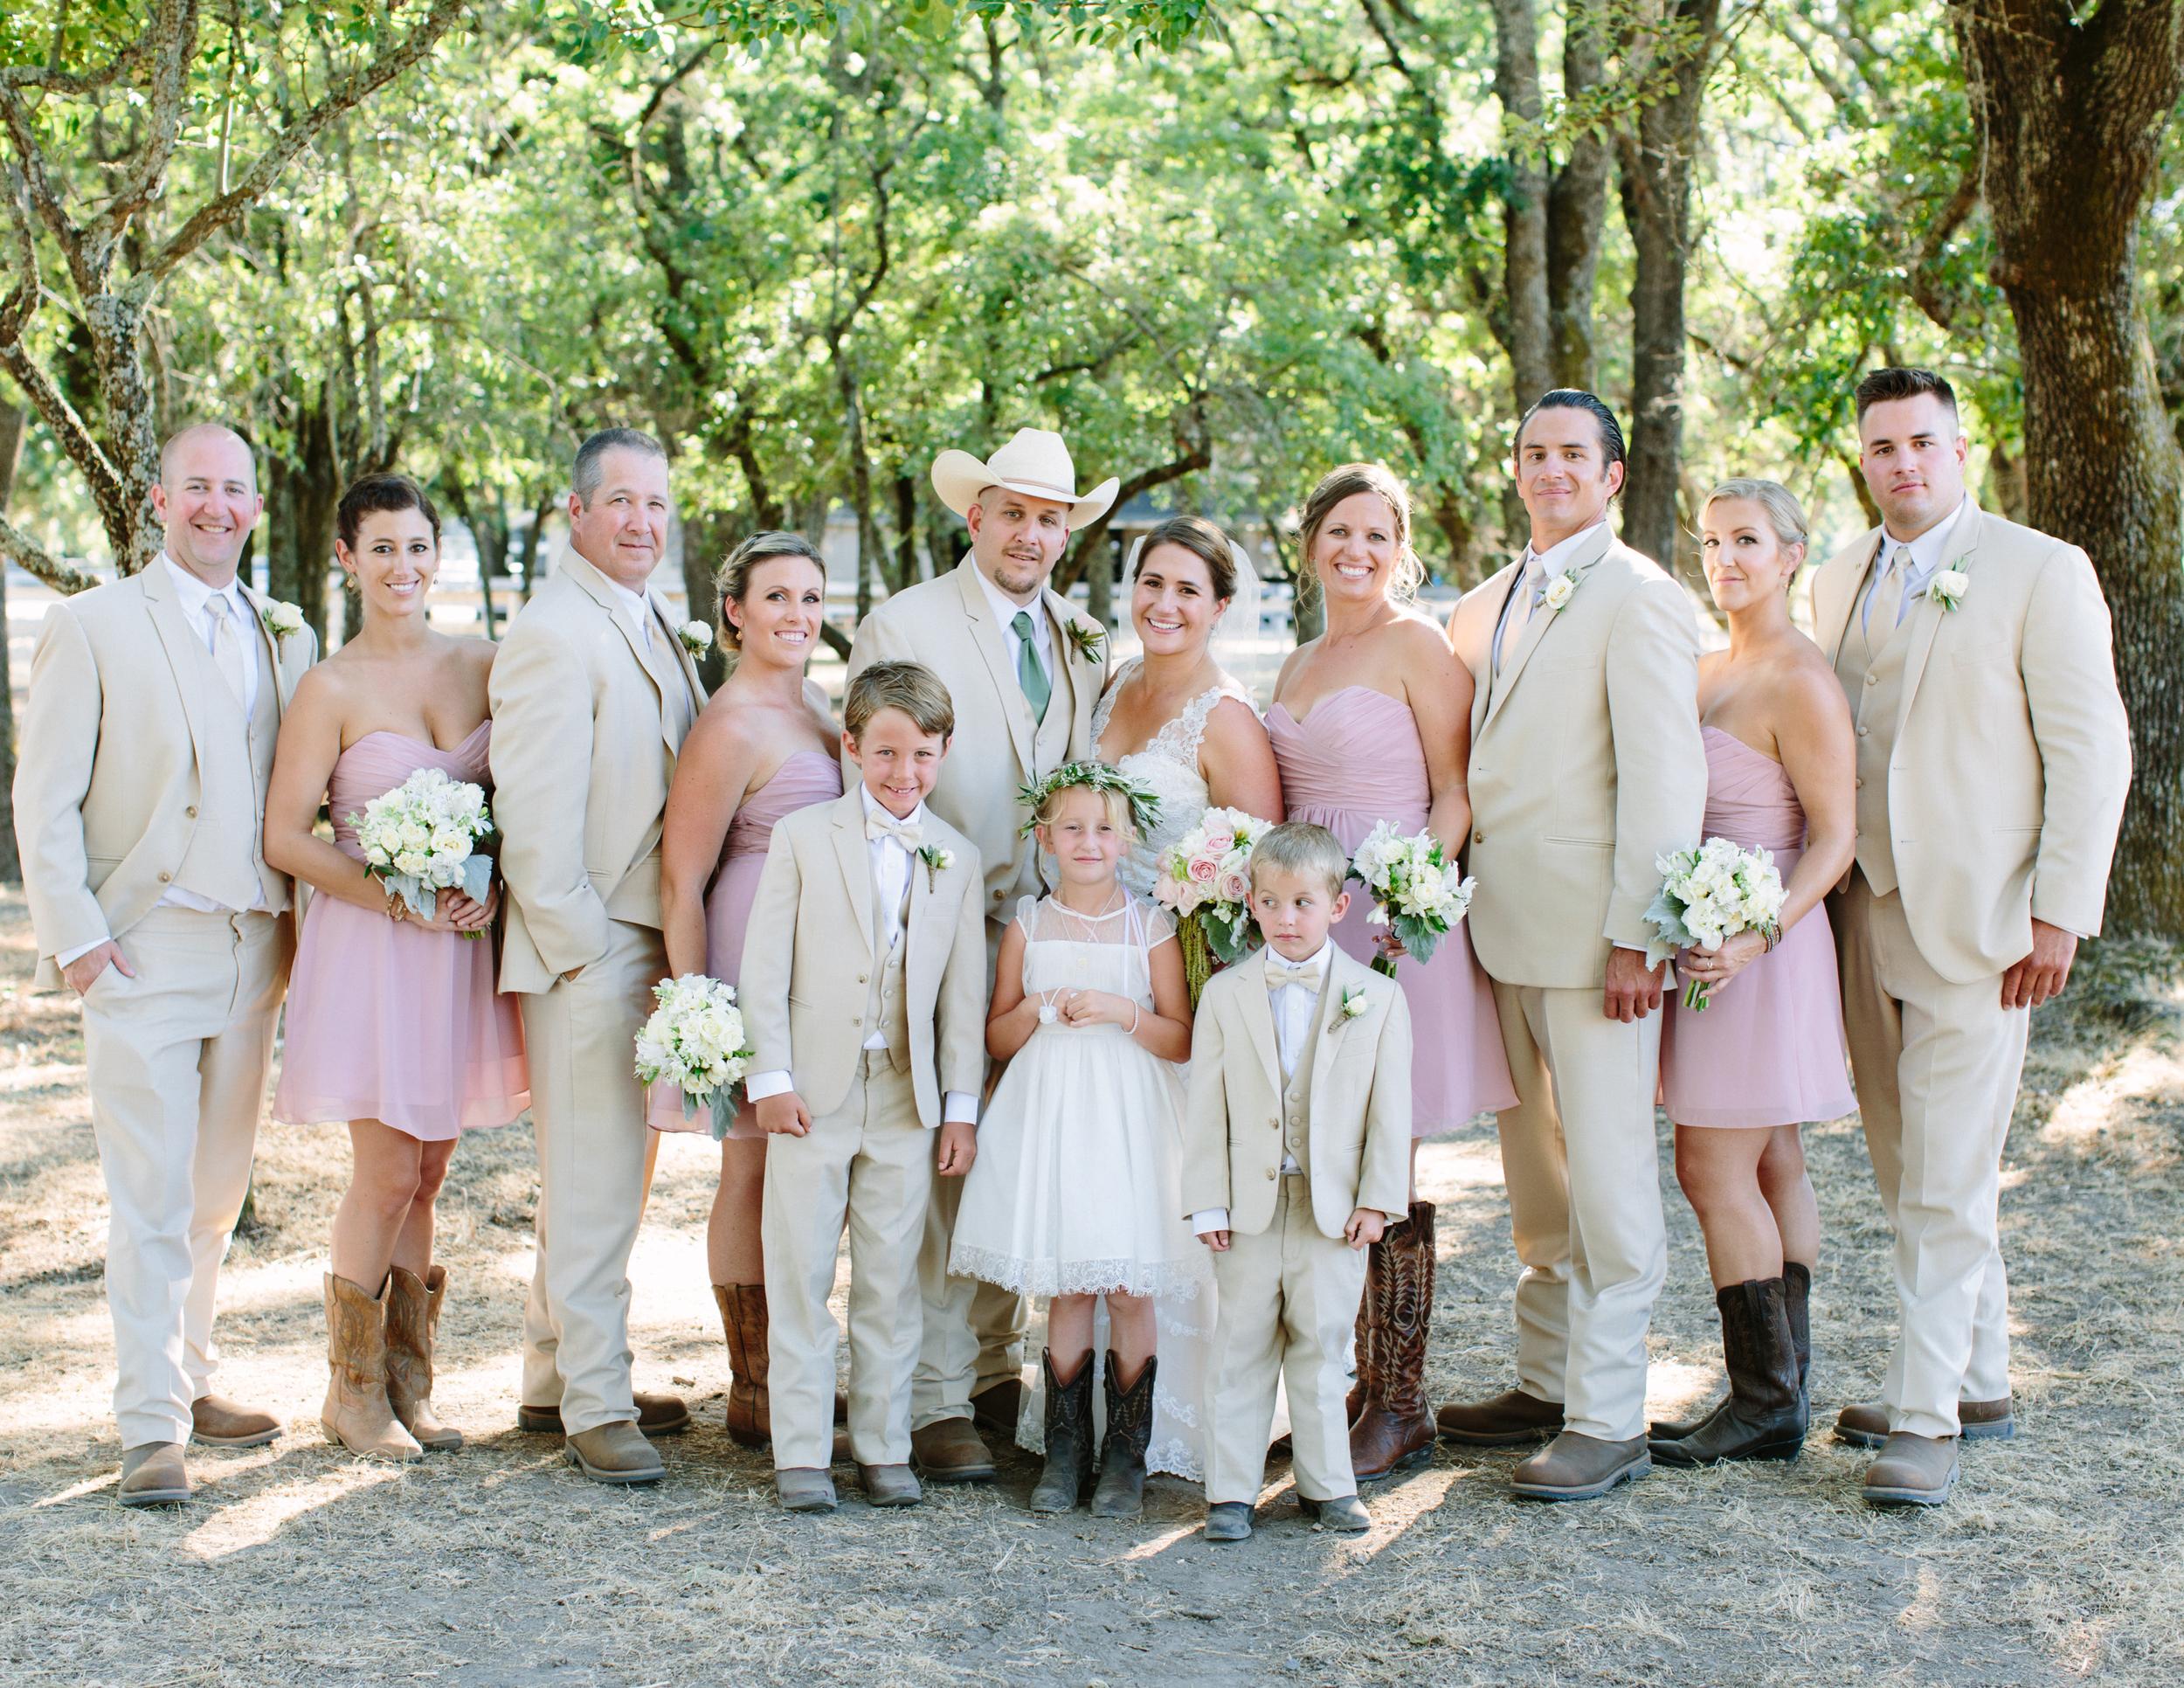 sonoma ranch wedding 9a.jpg